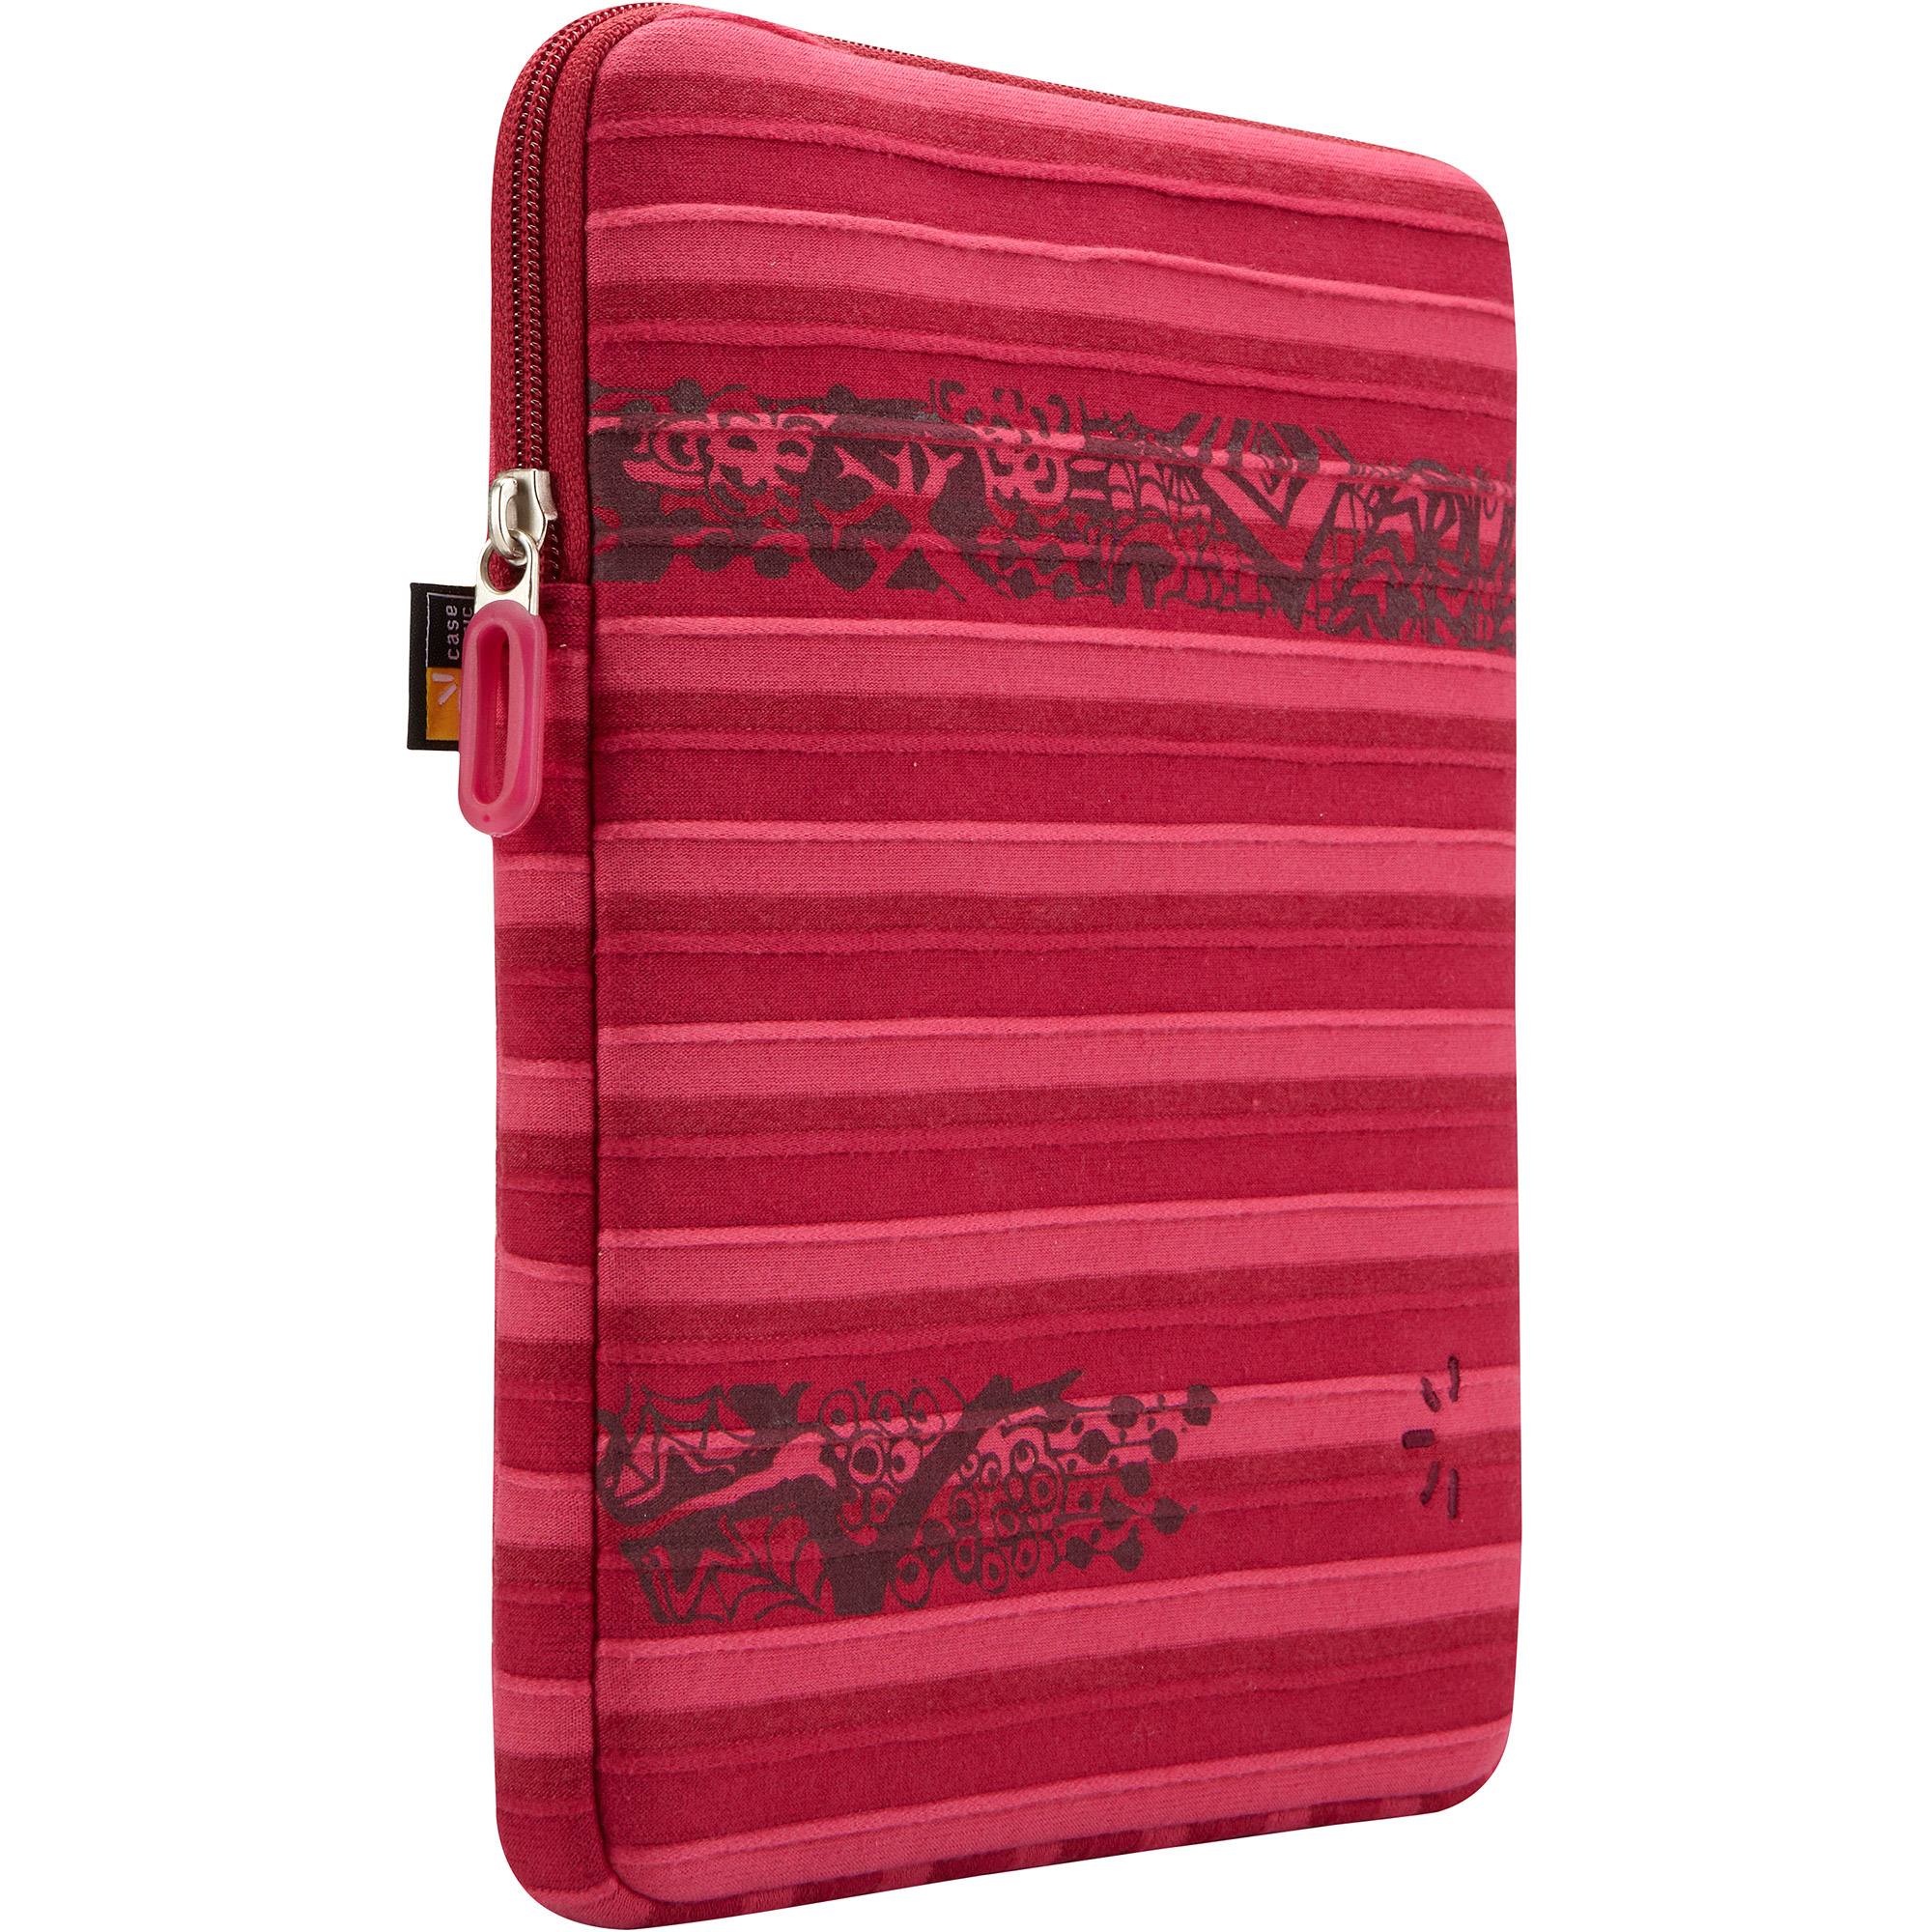 Case Logic iPad 2 Sleeve, Pink